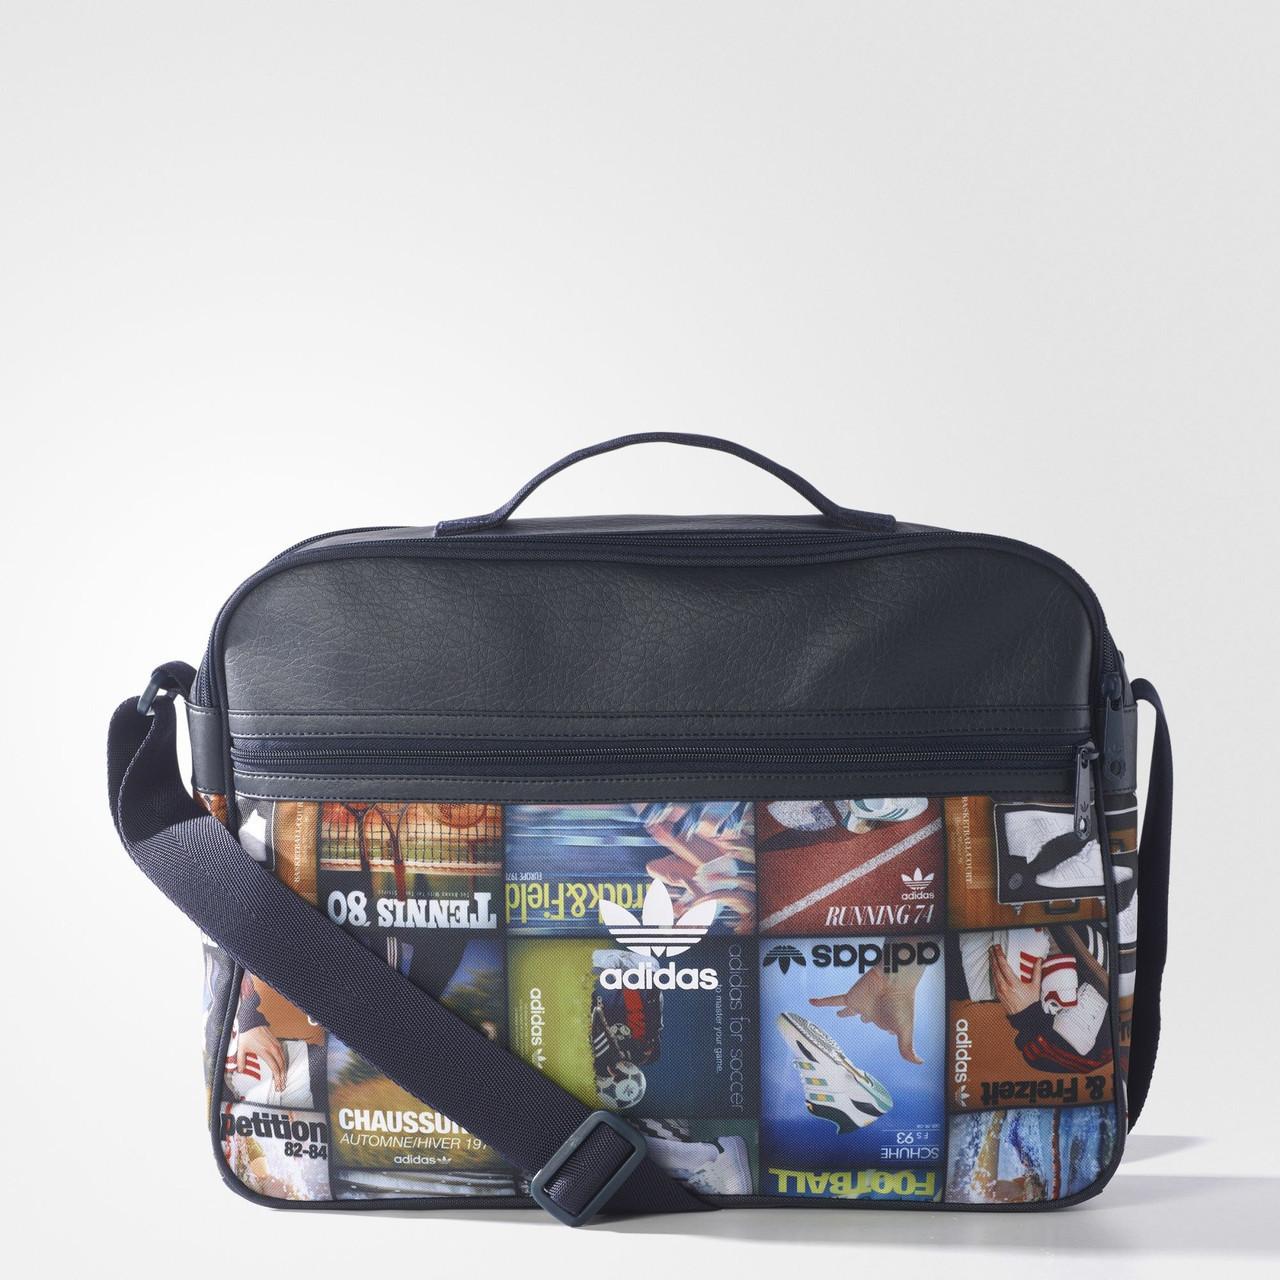 06a409f5b049 Сумка Adidas Originals через плече Back-to-School Airliner AY7780 - Интернет  магазин Tip